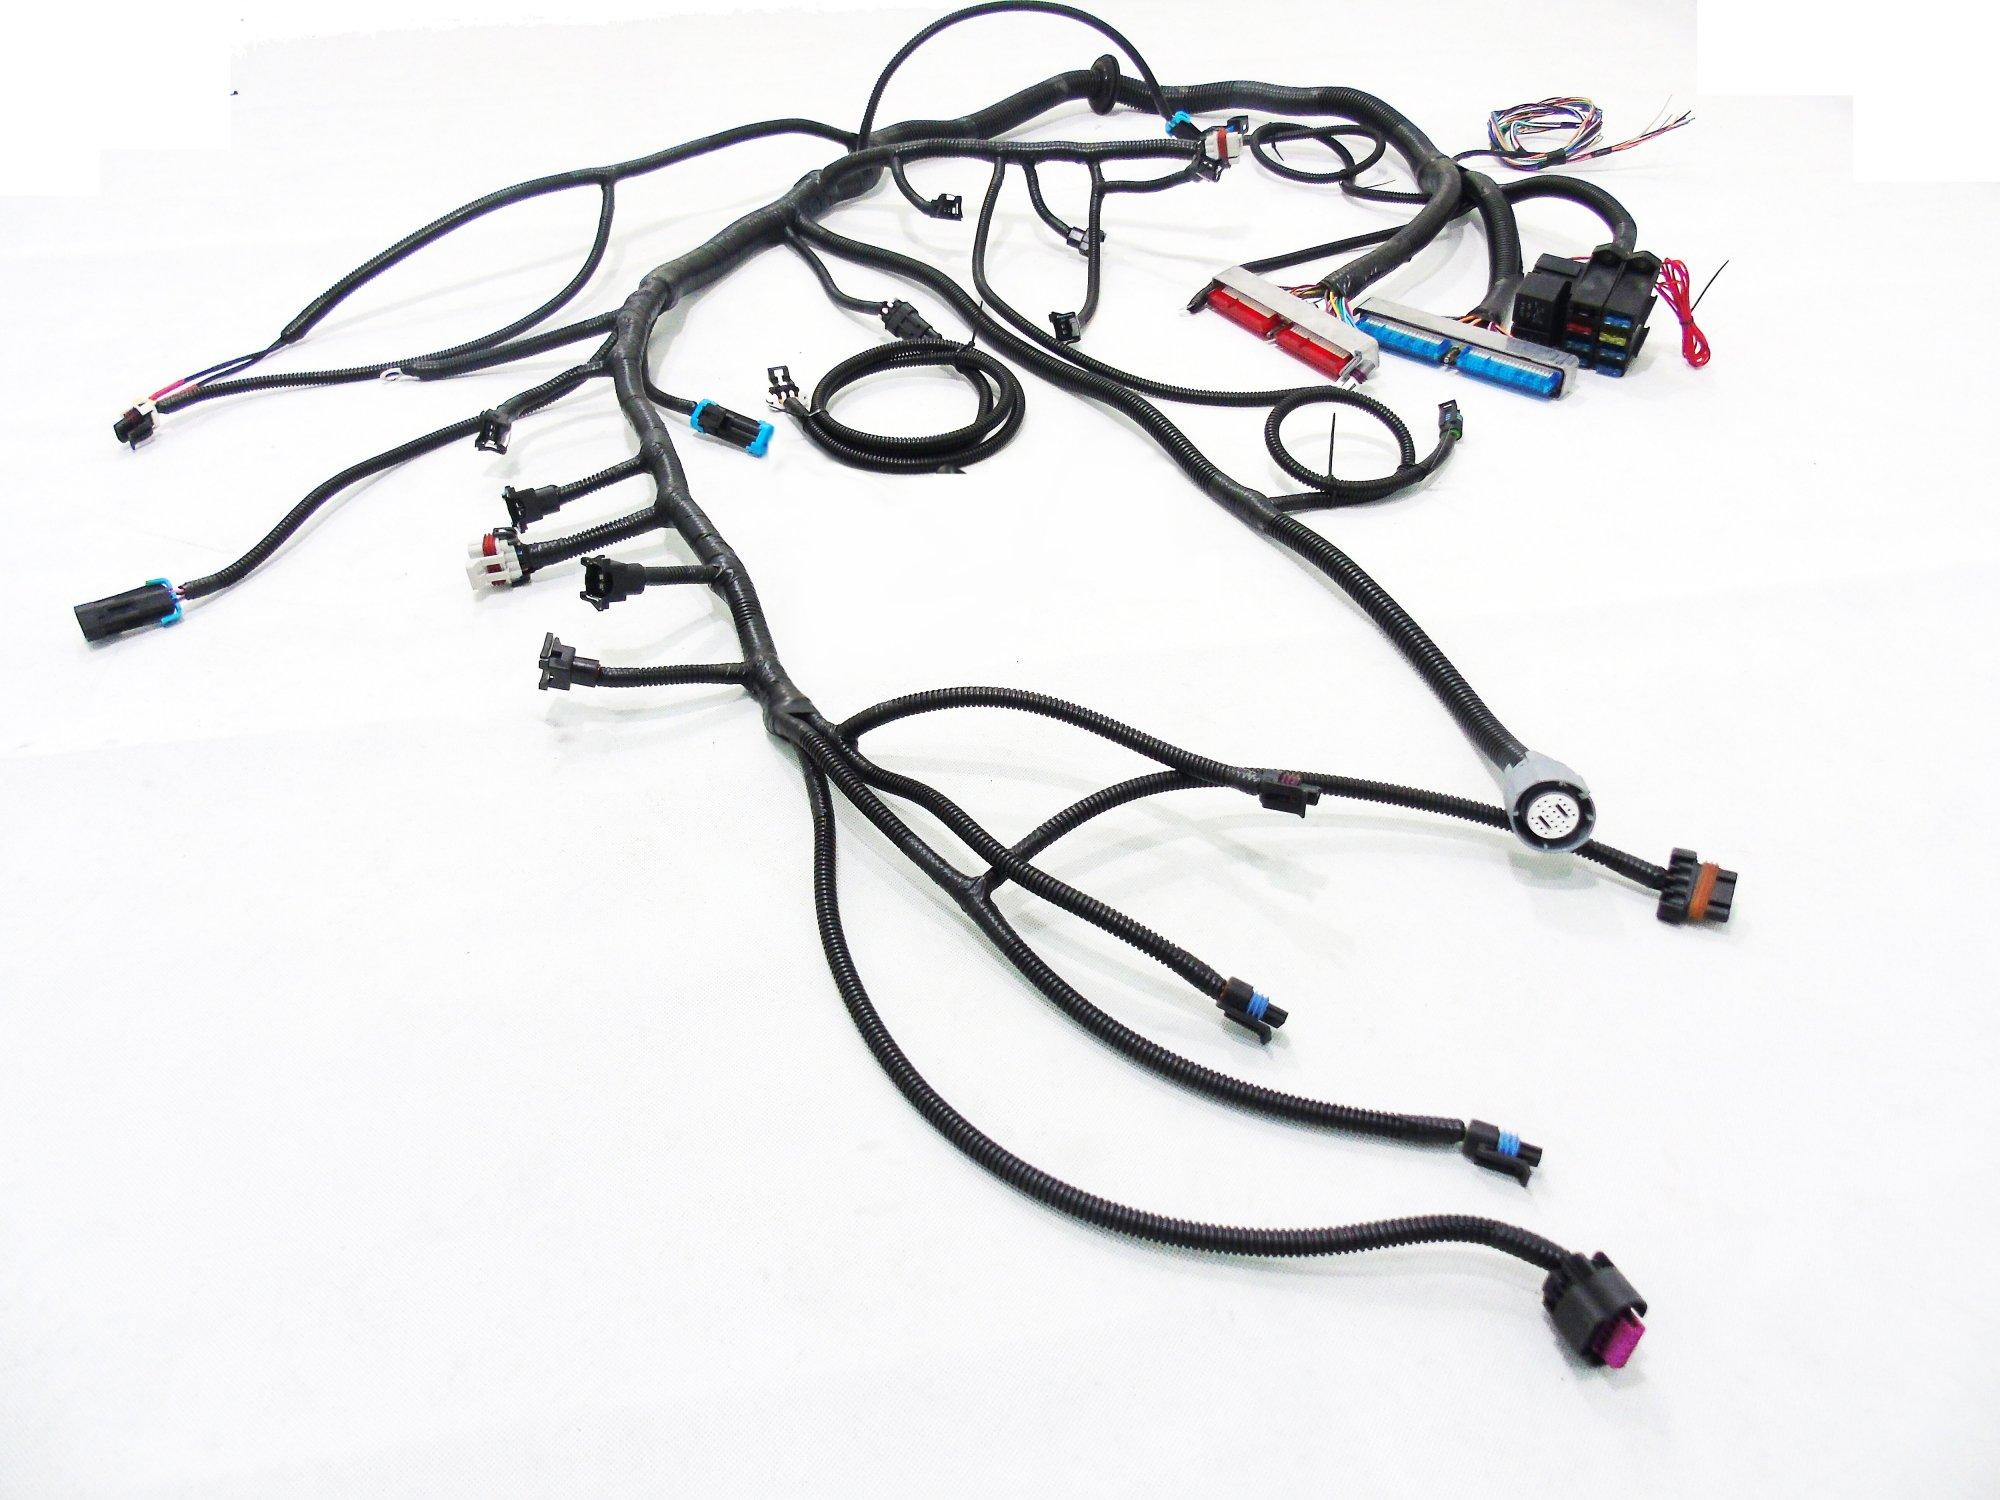 hight resolution of  97 04 ls1 w 4l60e 4l80e standalone wiring harness dbw